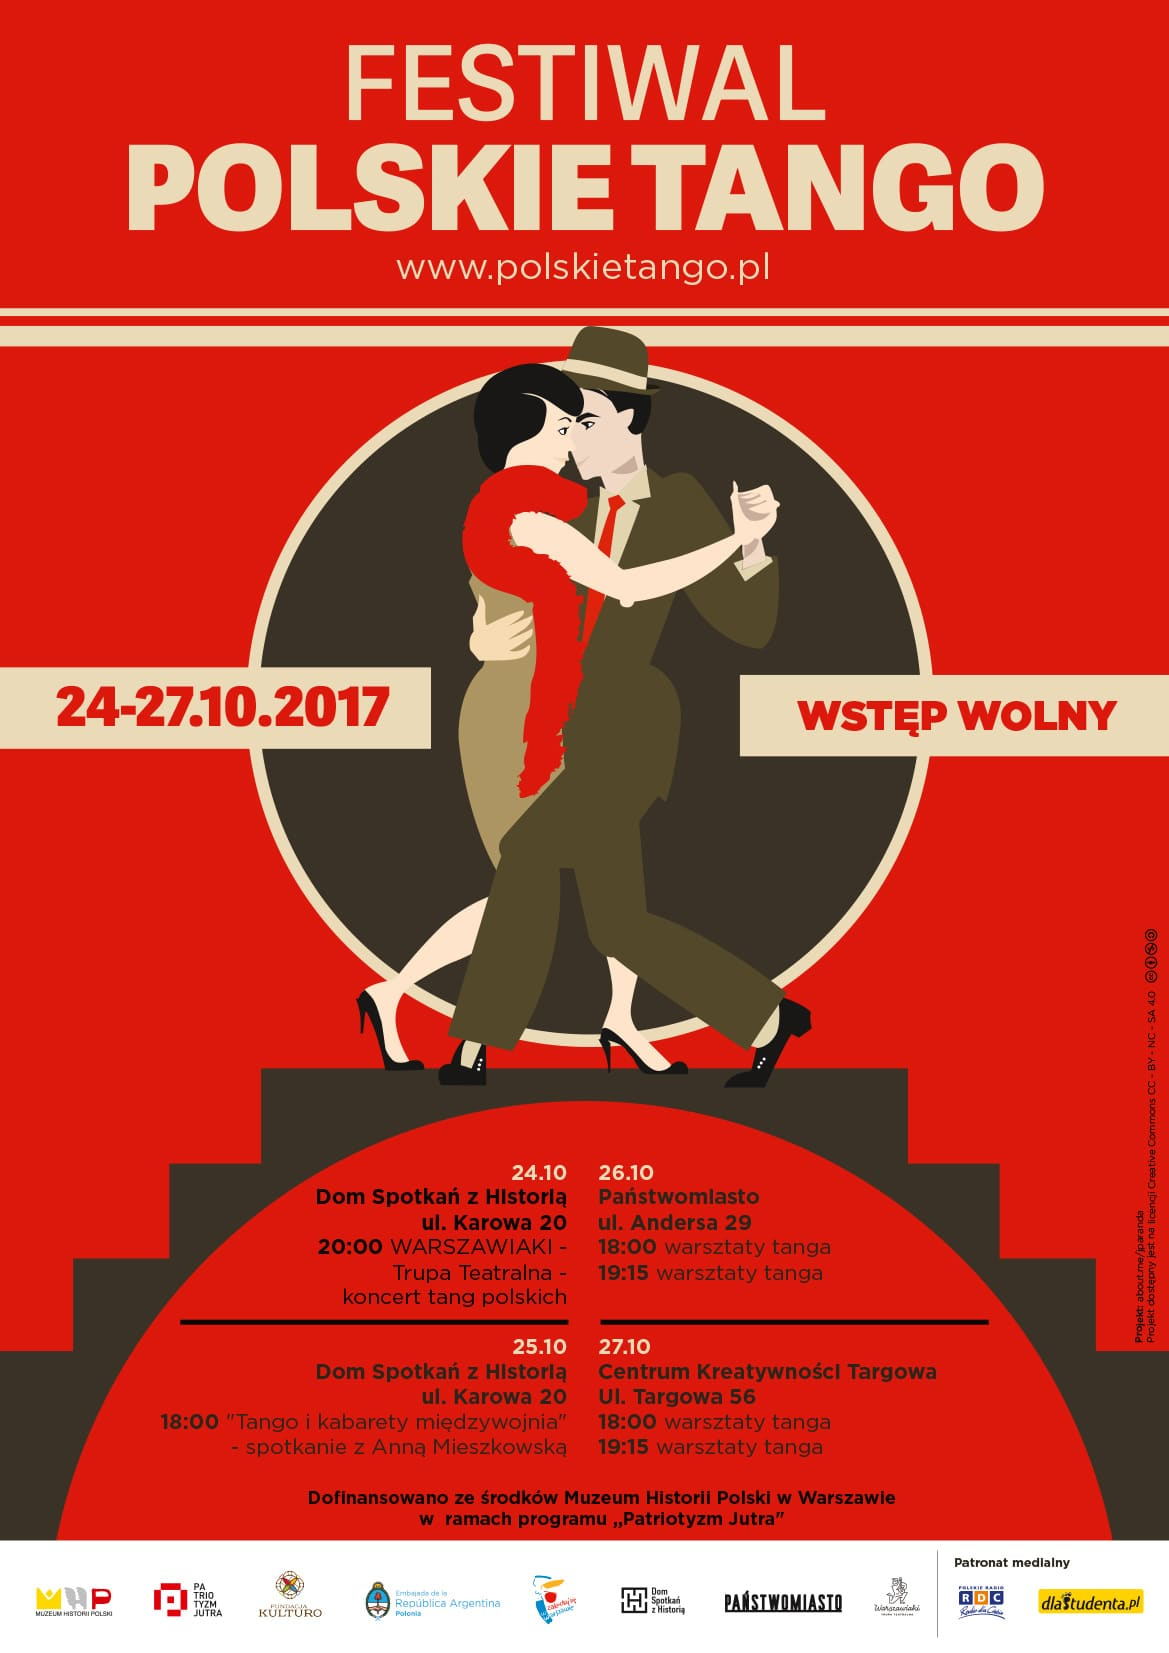 Festiwal Polskie Tango już niebawem!